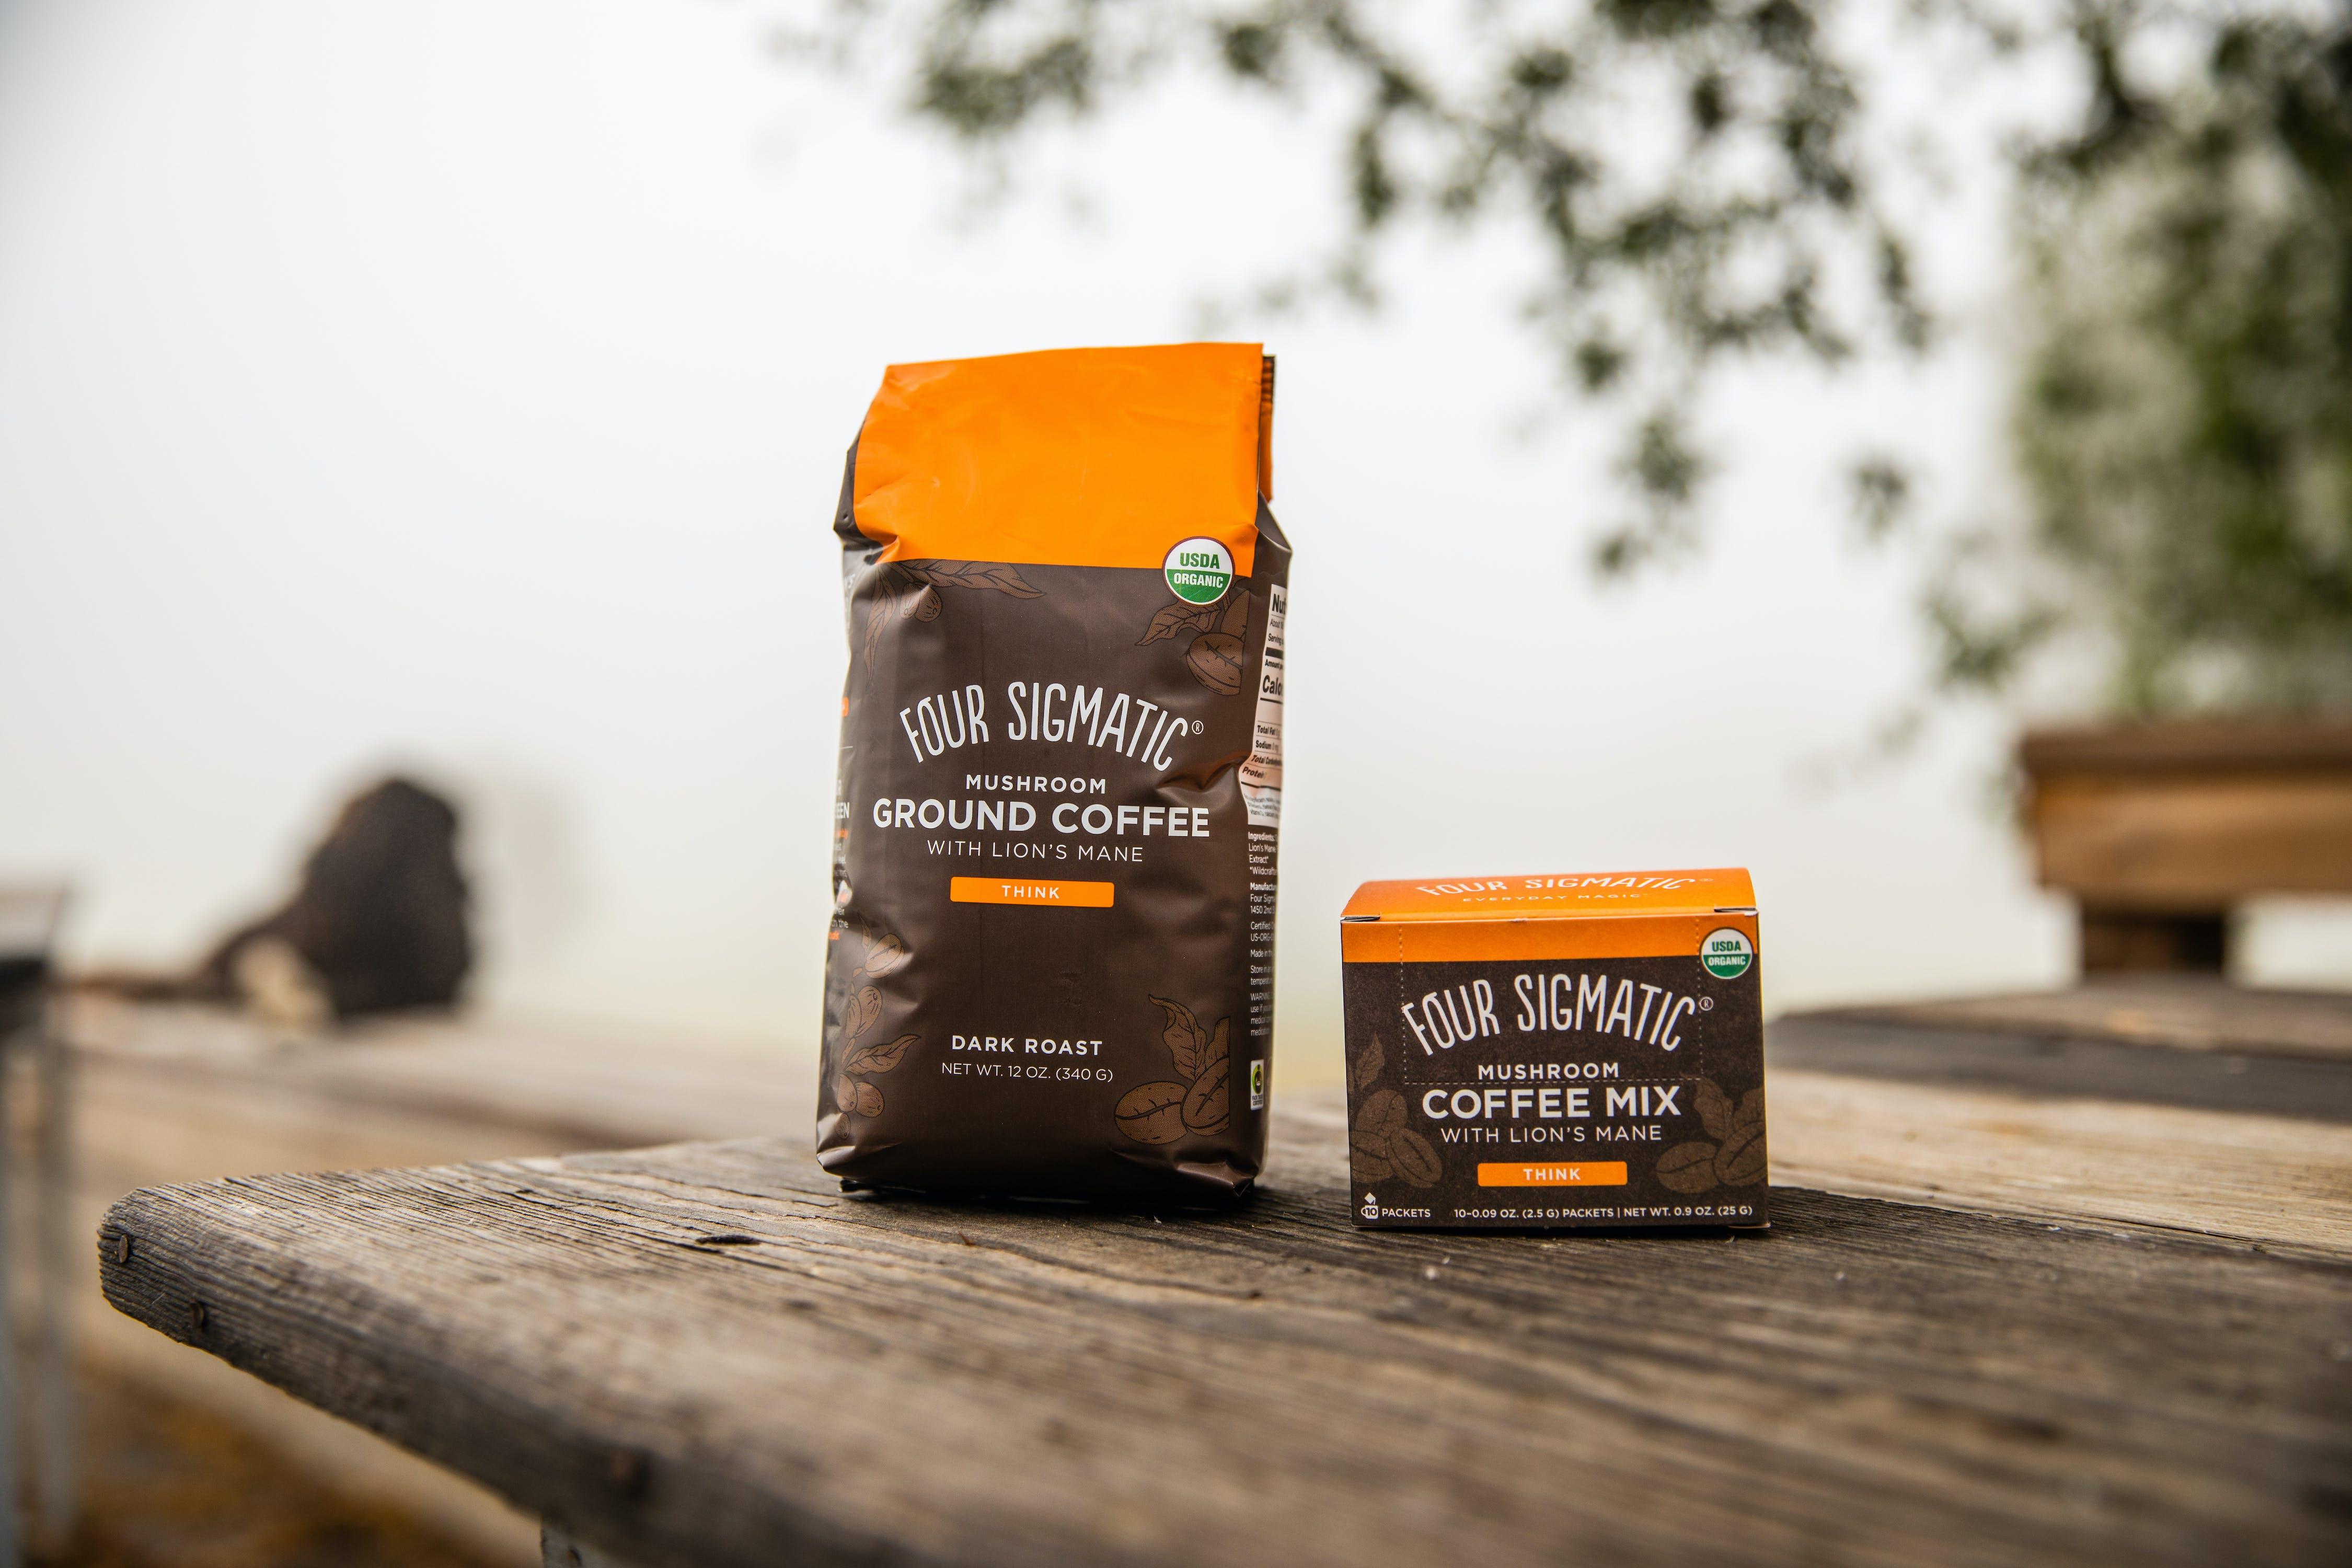 Lion's Mane Coffee